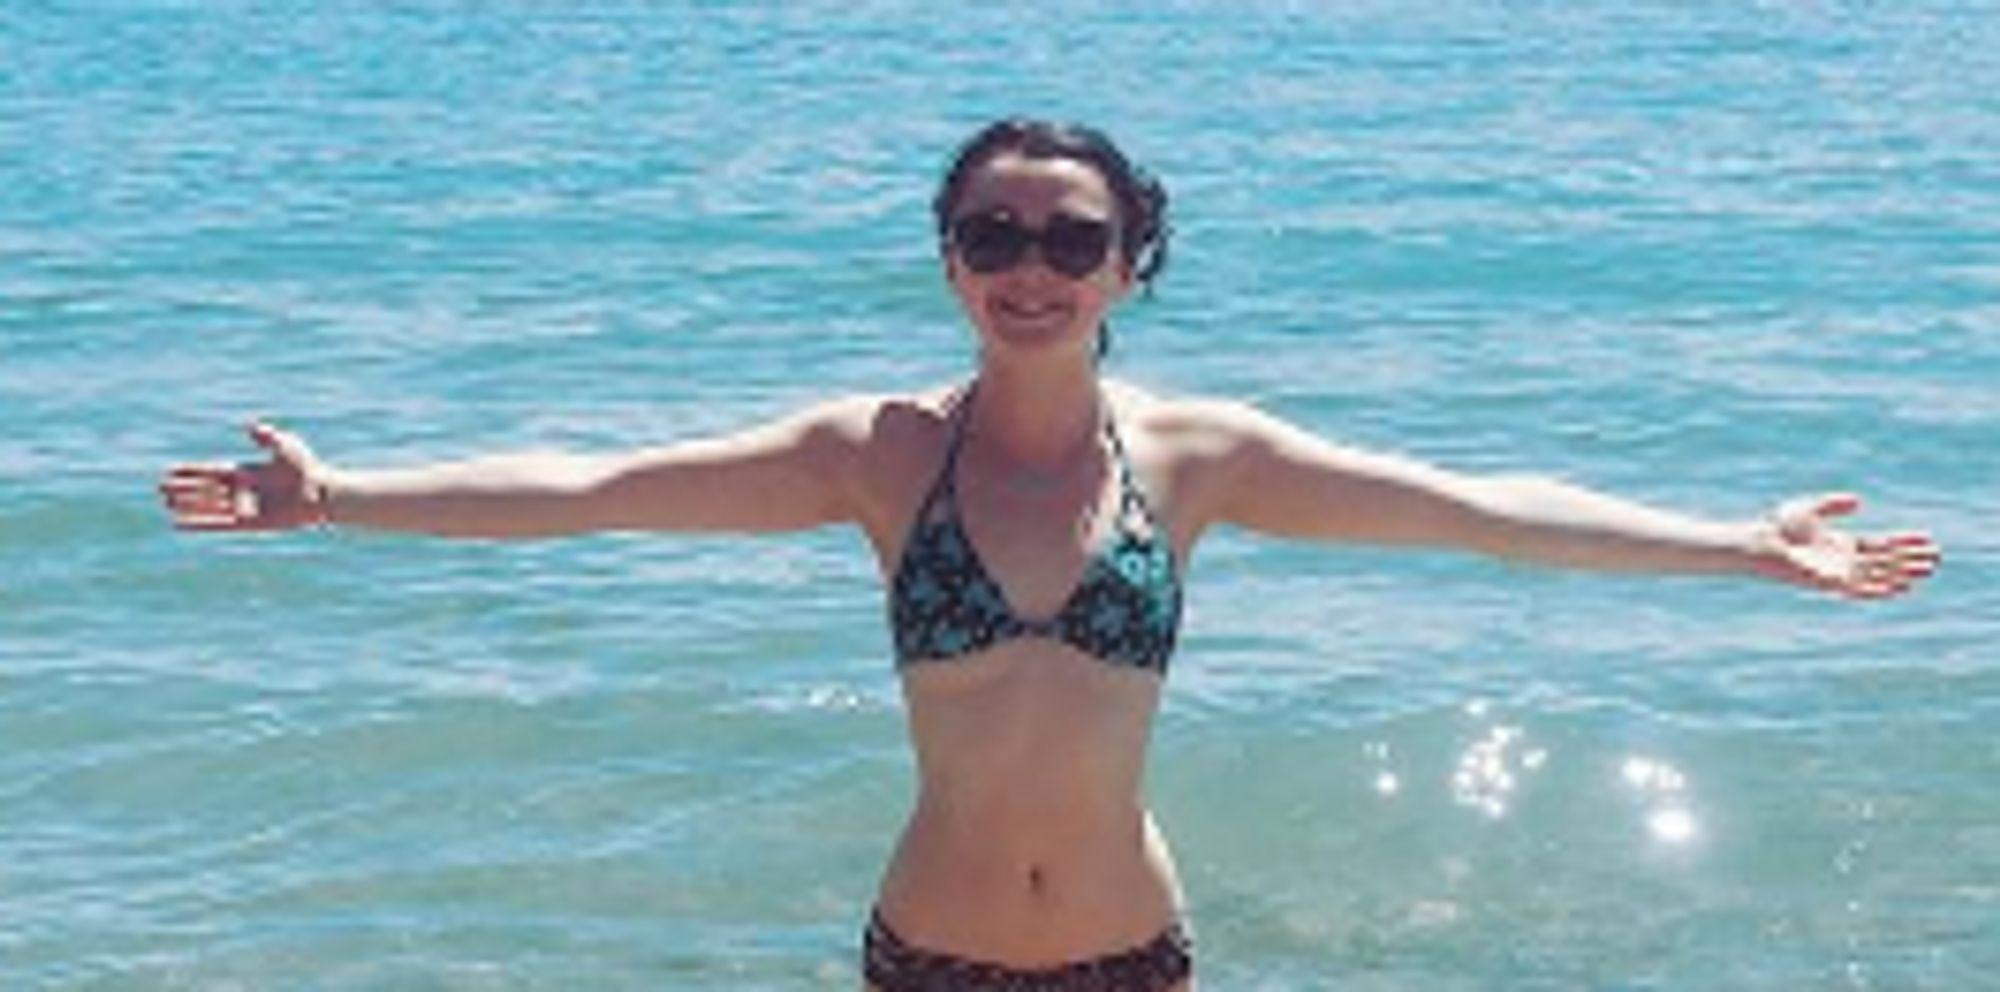 Maisie Williams Channels Her Inner Mermaid With Bikini ...